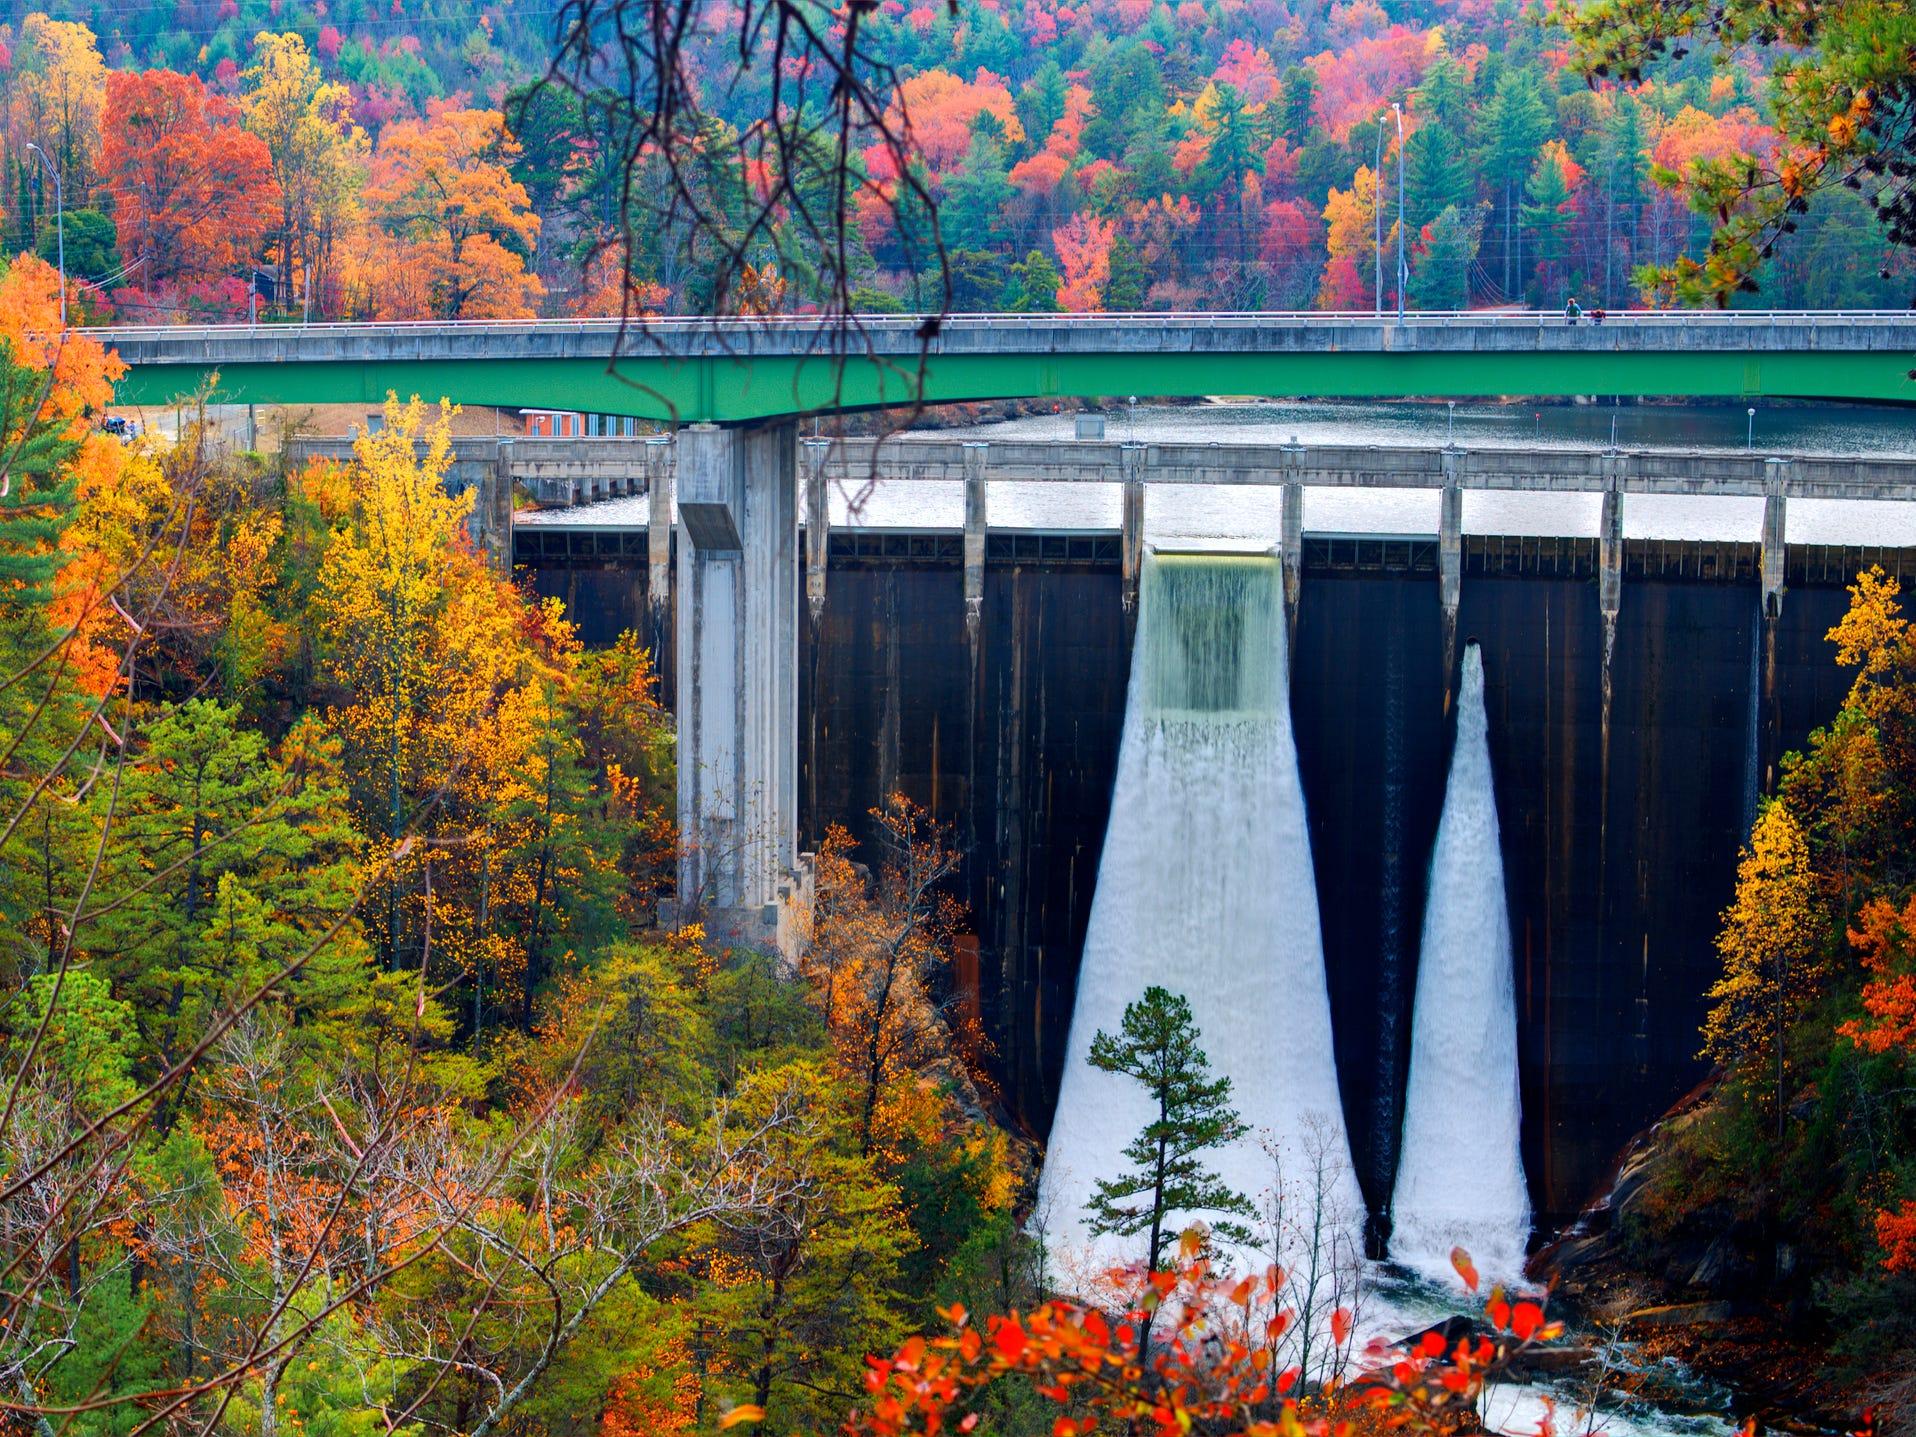 Tallulah Falls Dam in Georgia.